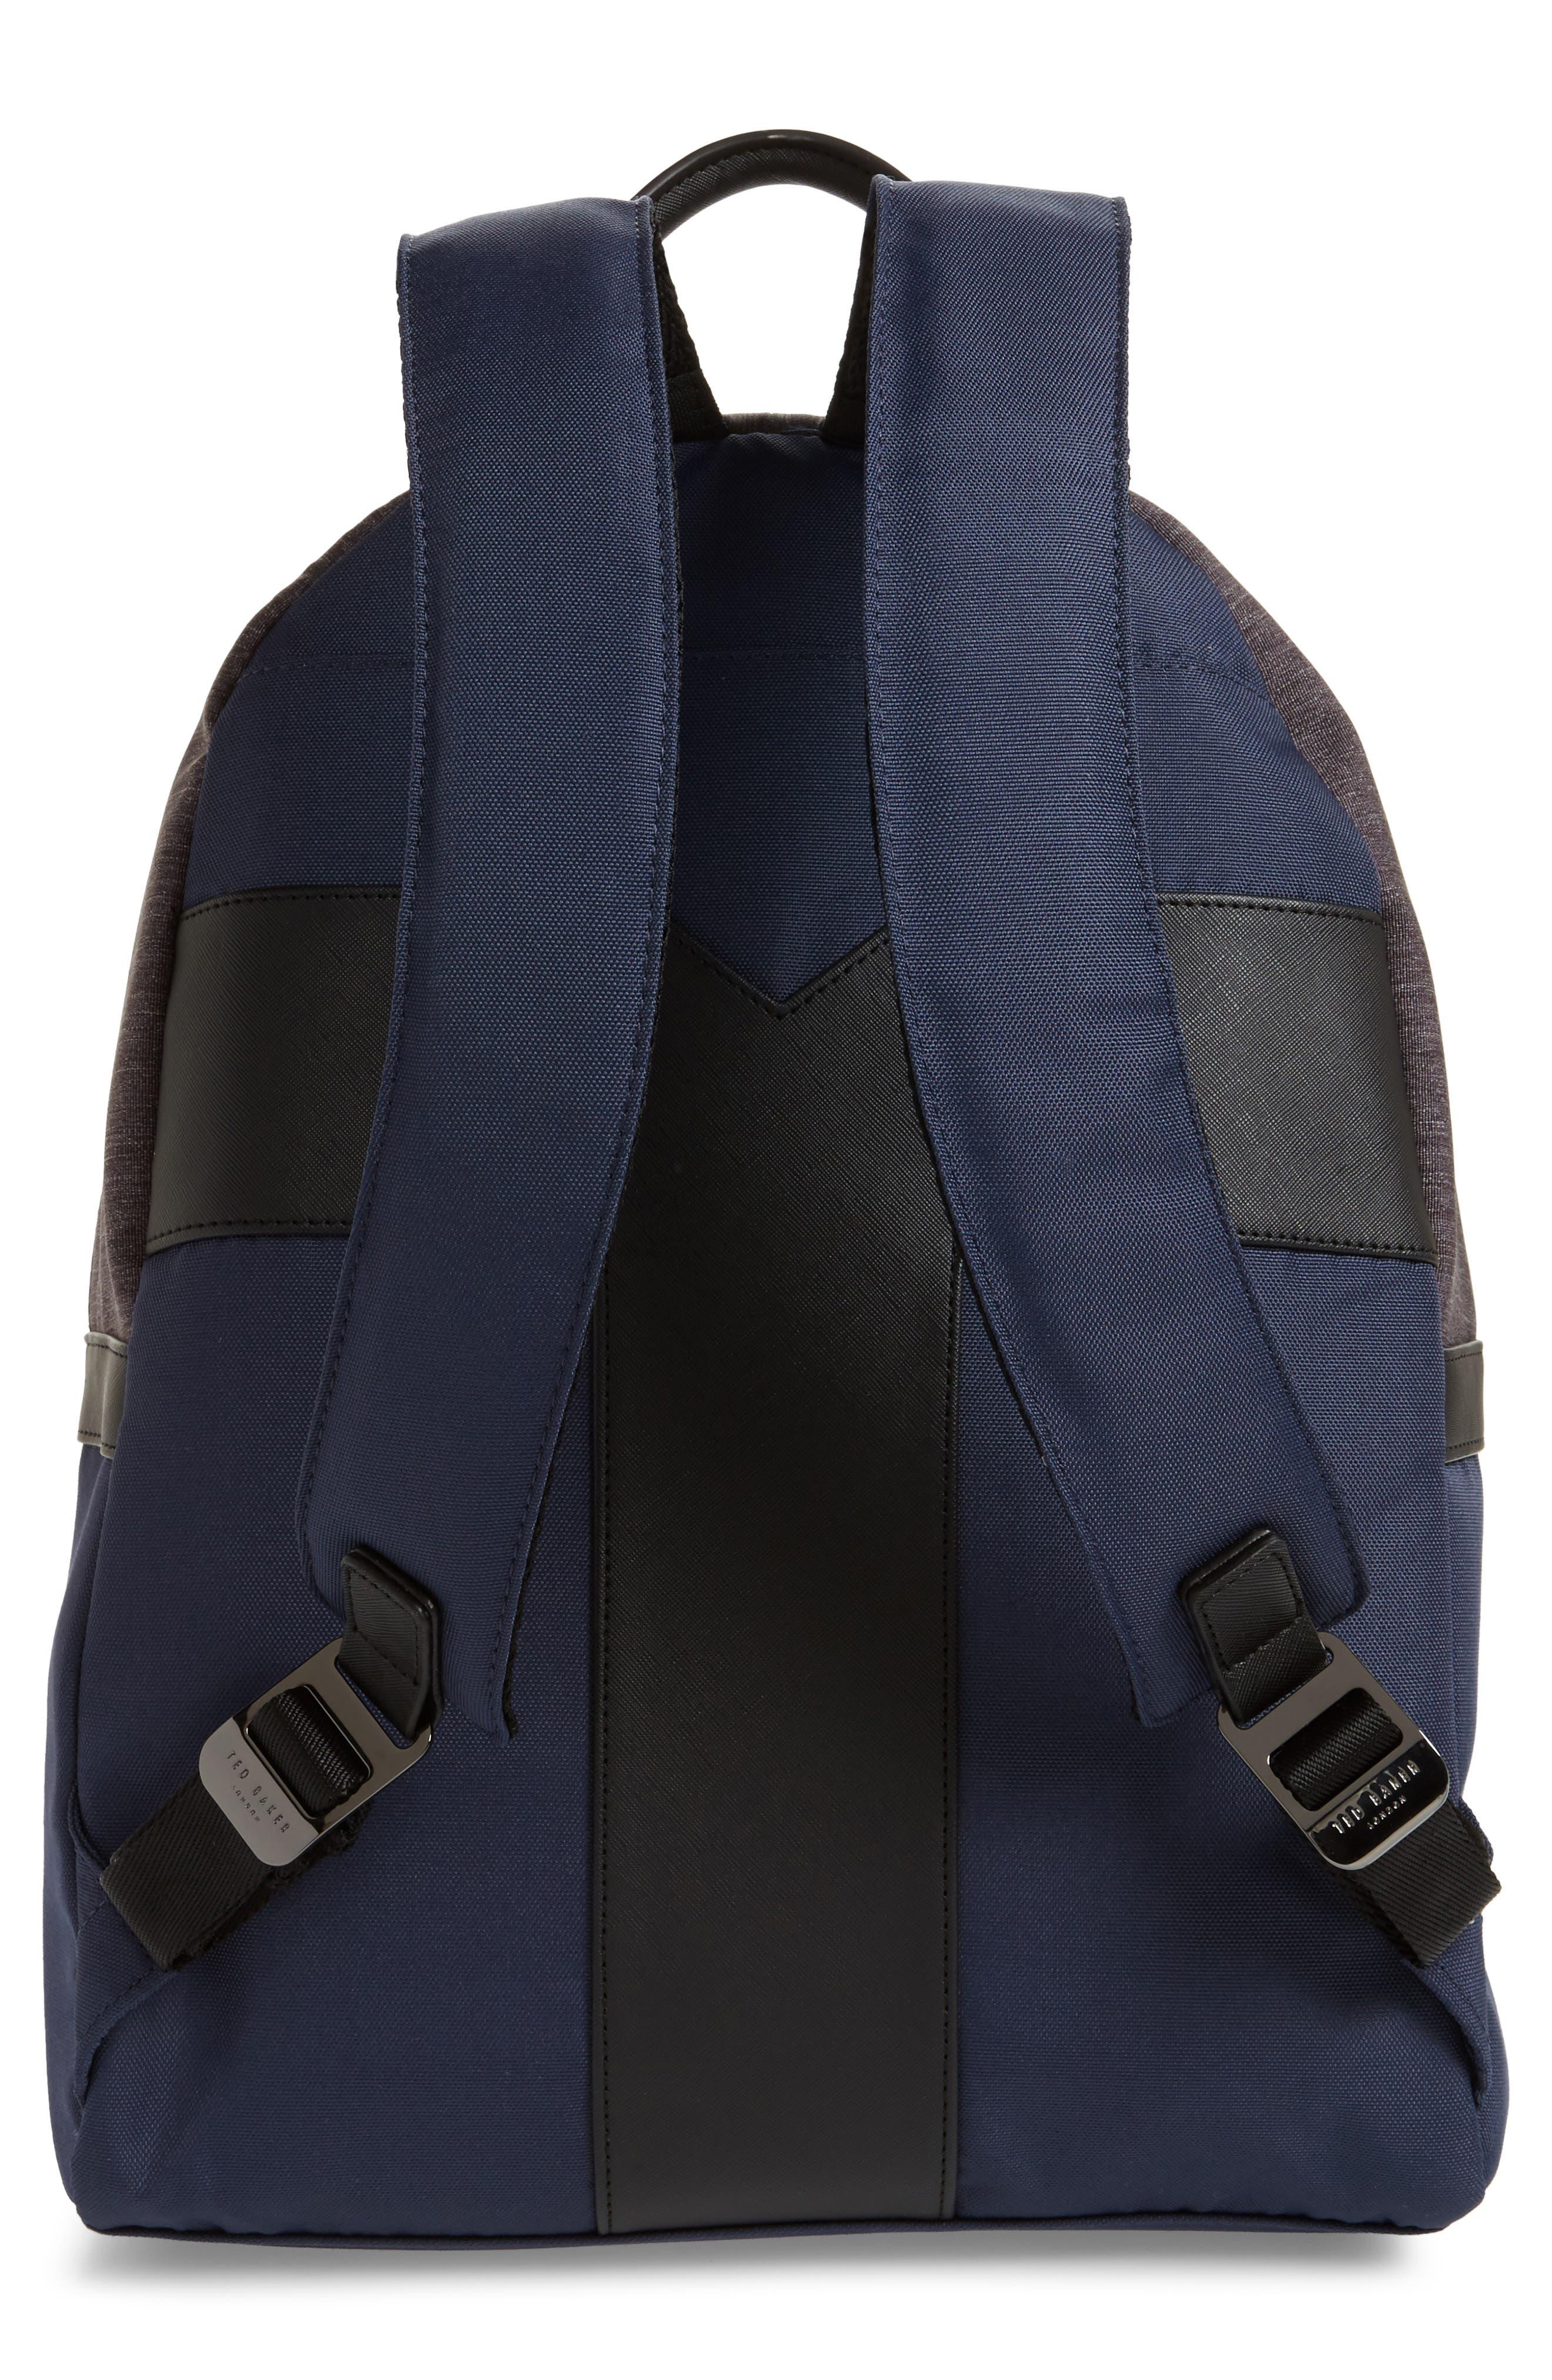 Mangoo Backpack,                             Alternate thumbnail 3, color,                             Navy